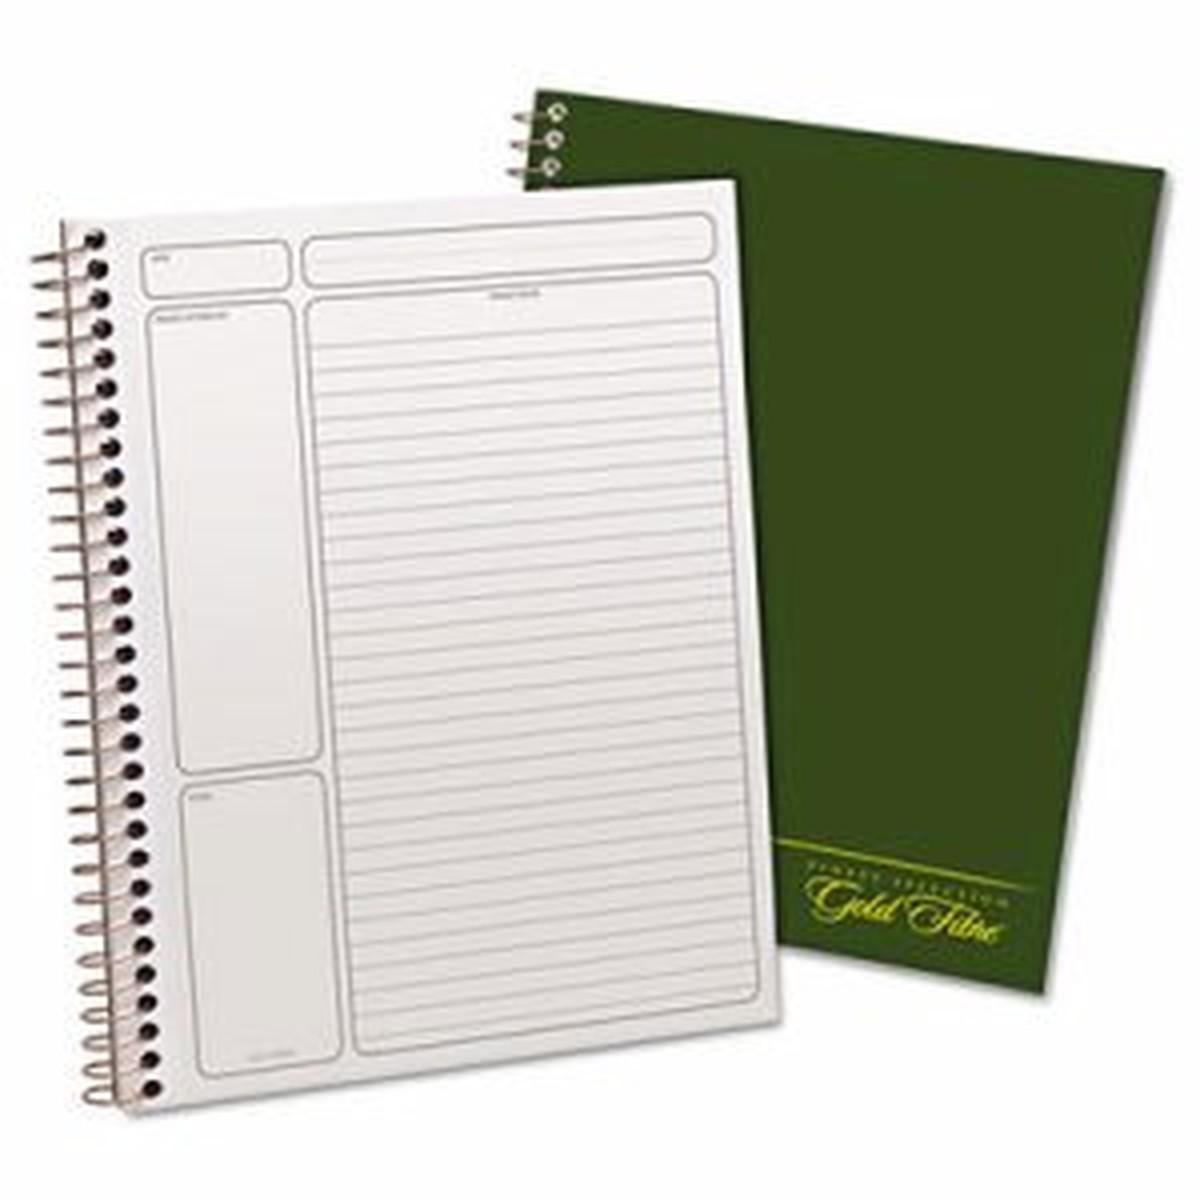 Gold Fibre Wirebound Writing Pad w/Cover, 9 1/4 x 7 1/4, White, Green Cover